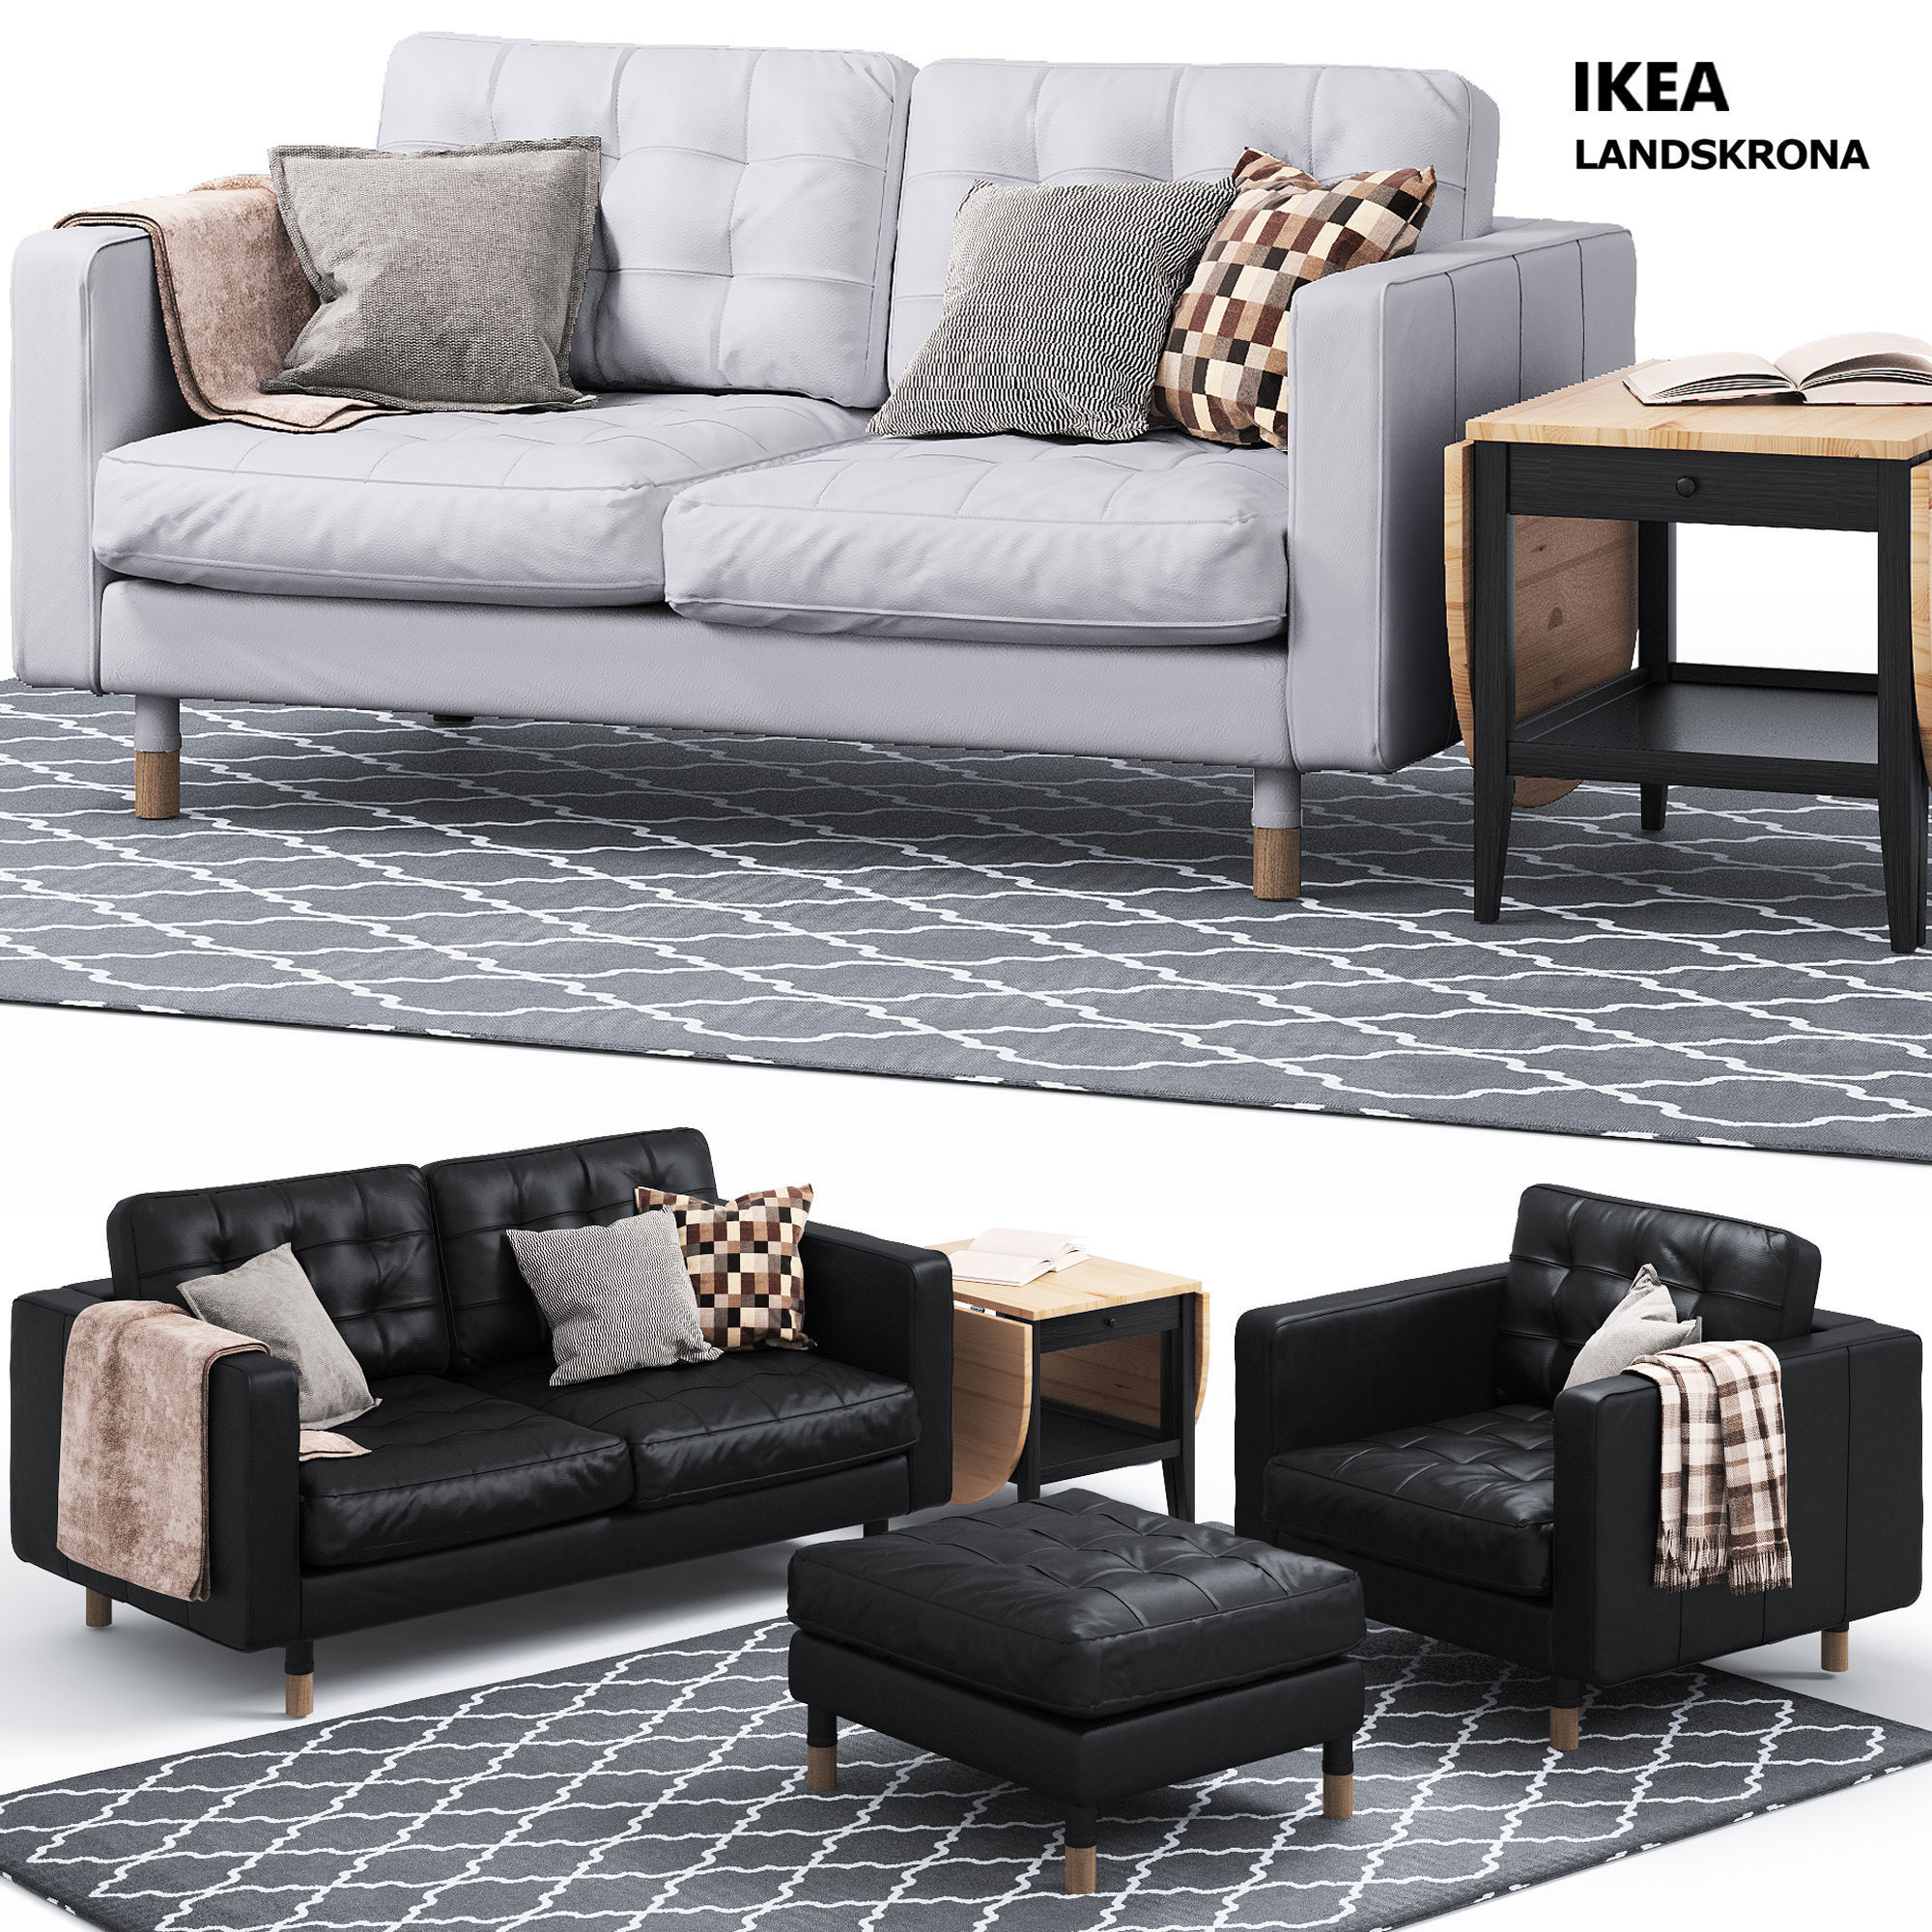 Sofa And Chair Landskrona Series Ikea